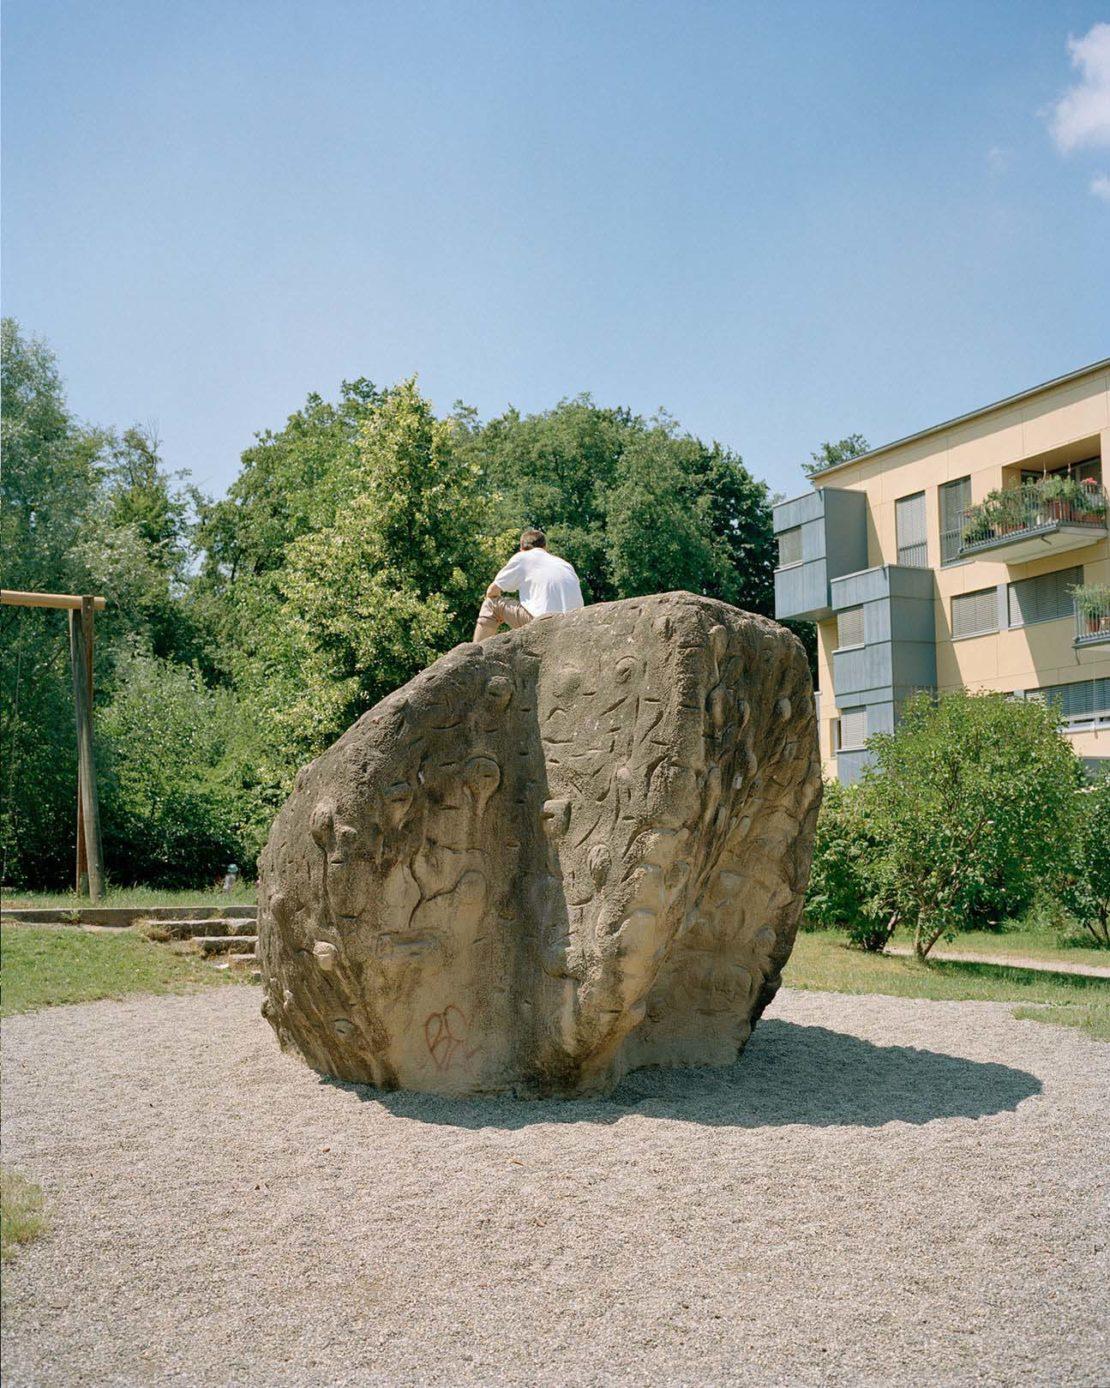 Sculpture outside the Green City Hotel in Vauban